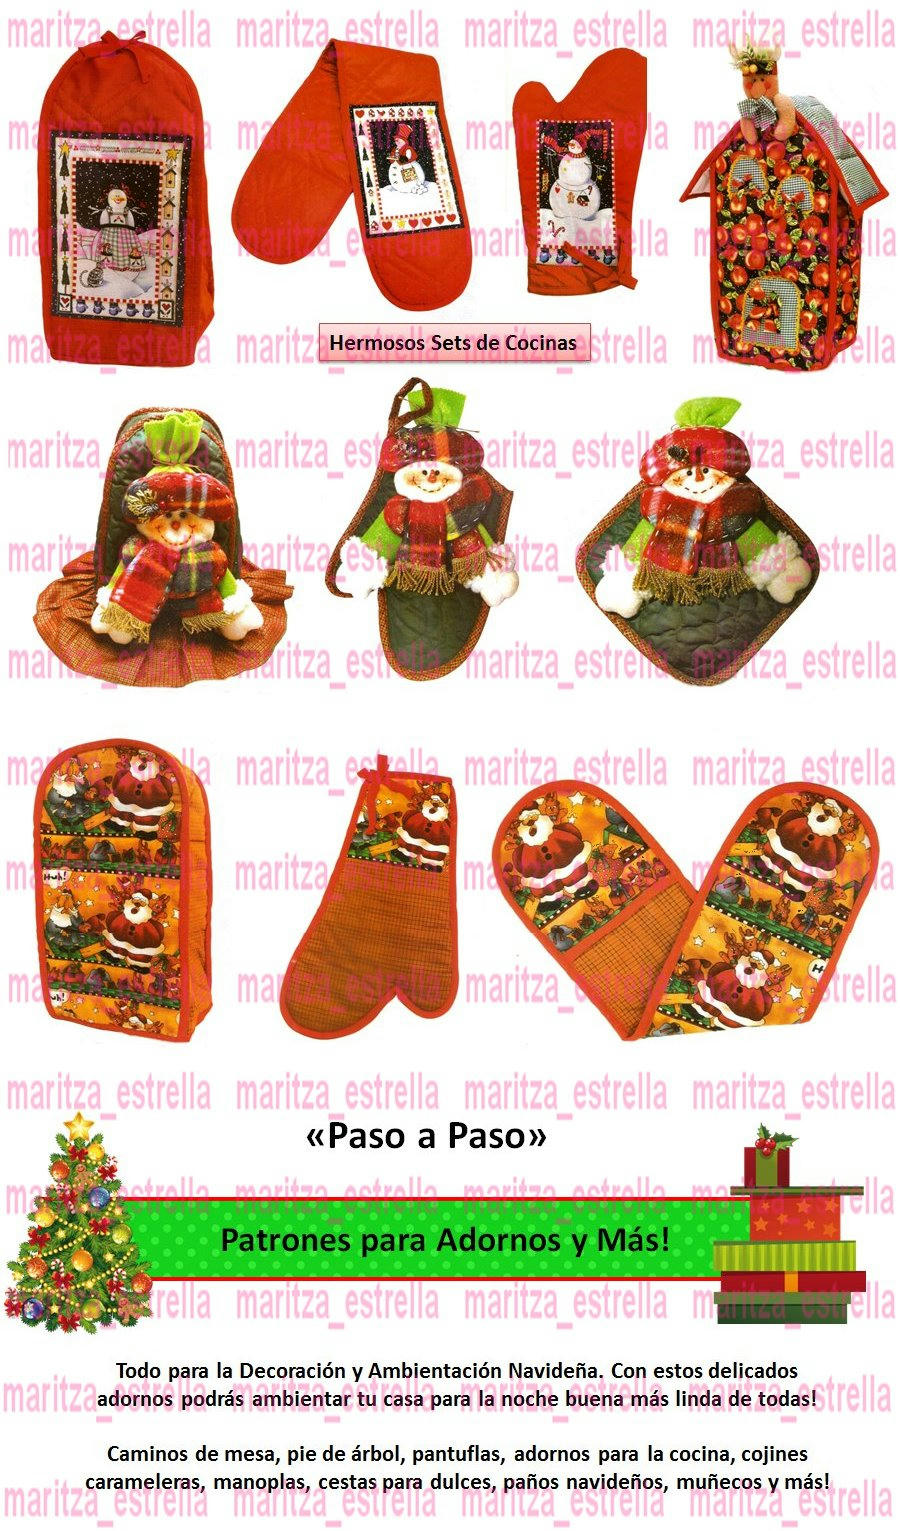 Imagenes De Lenceria De Baño De Navidad:Kit Patrones Lenceria Navidad Juegos De Baños Muñecos Arbol BsF280